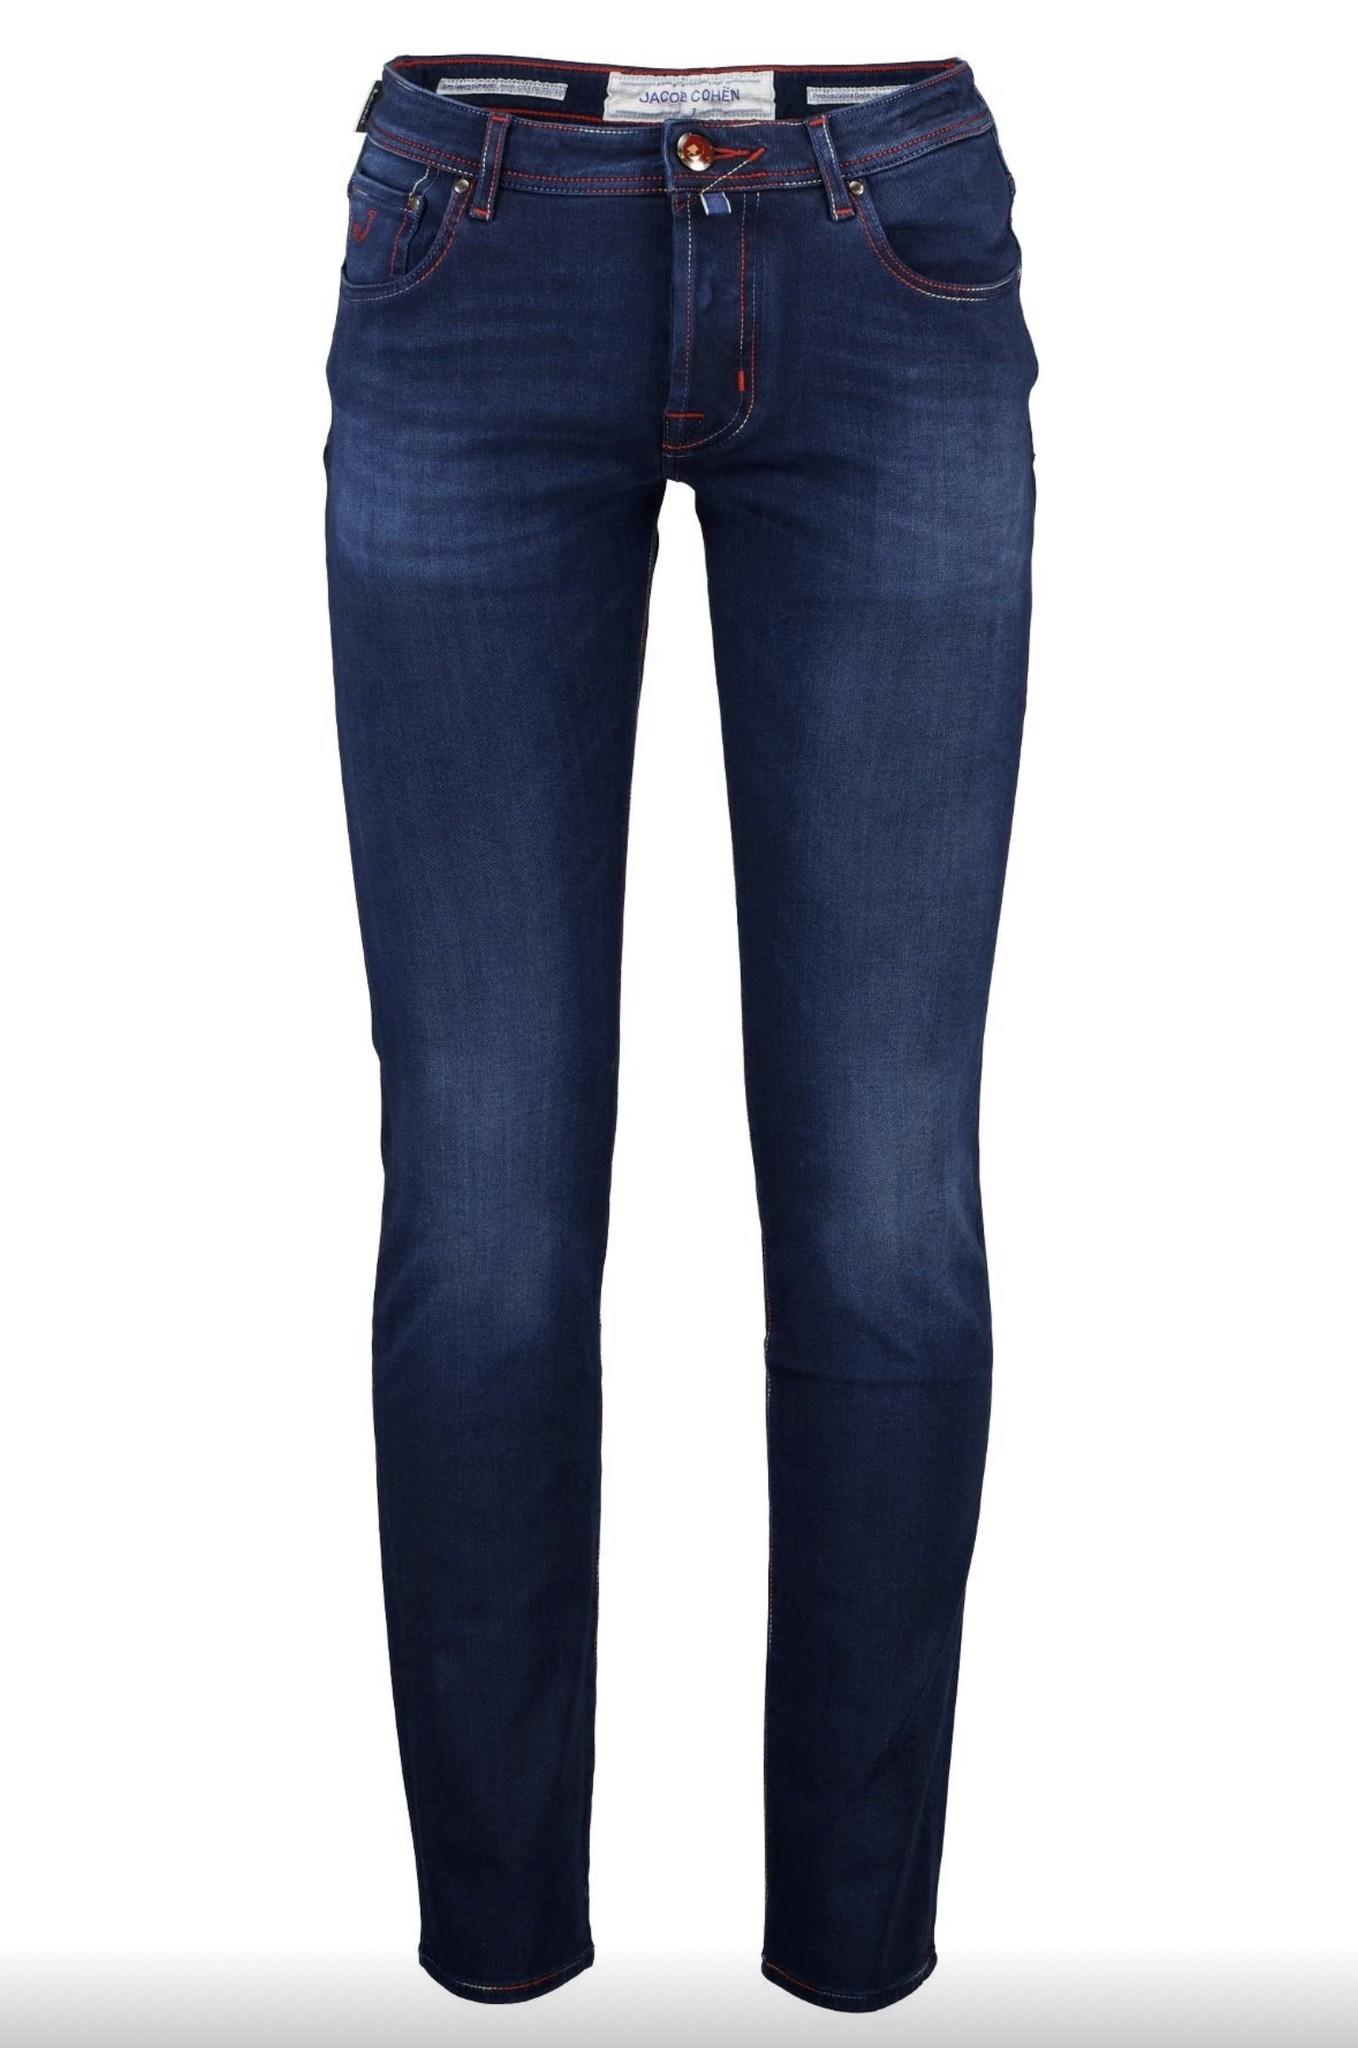 J622 Slim Comf Jeans-1